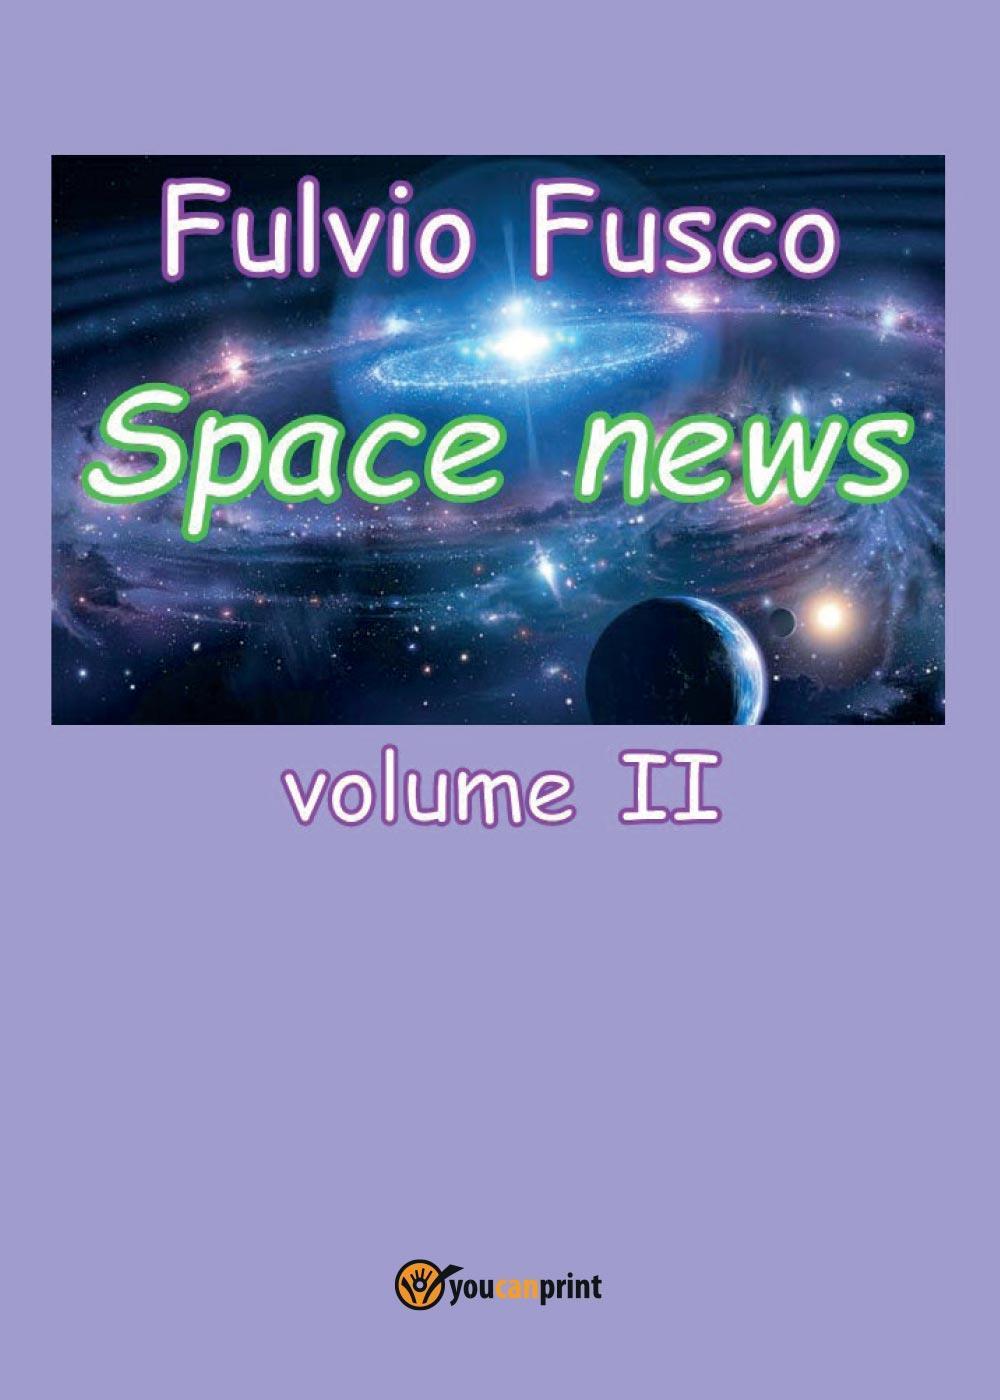 Space news. Vol. II